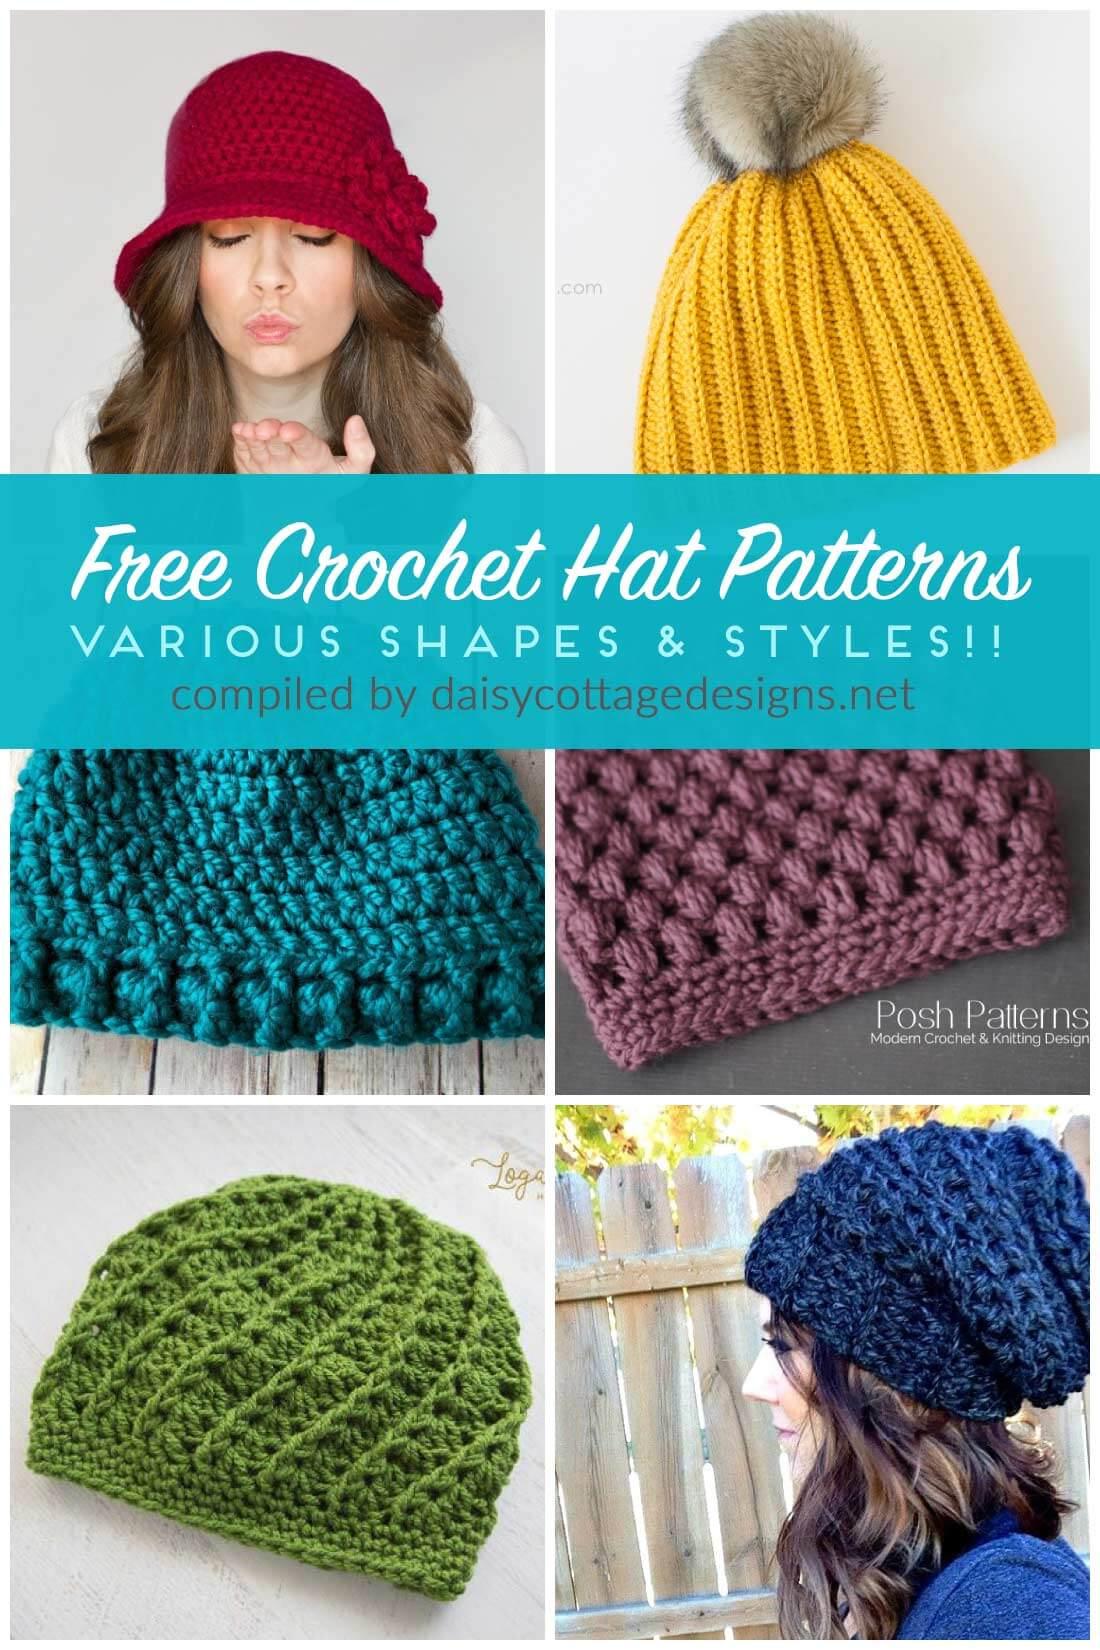 free crochet hat patterns | free crochet patterns | crochet patterns | use lzqnfdz